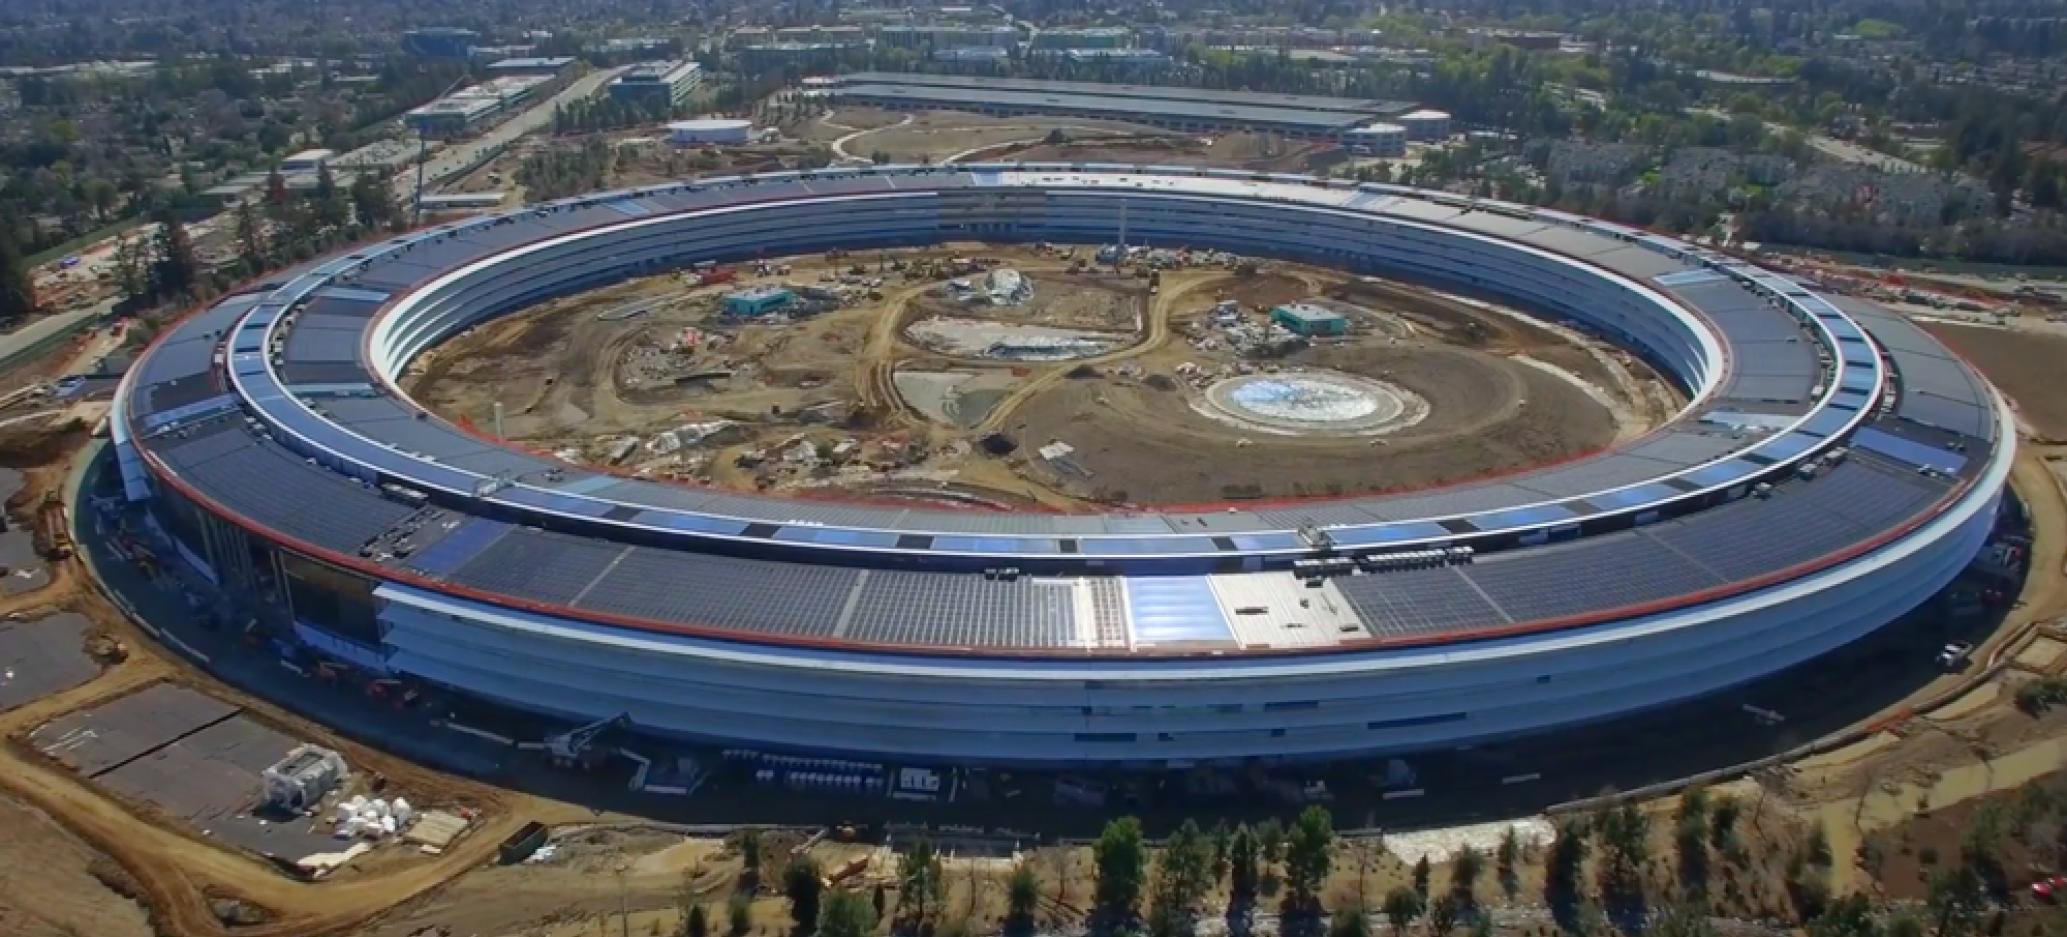 Apple's New $5 Billion Campus